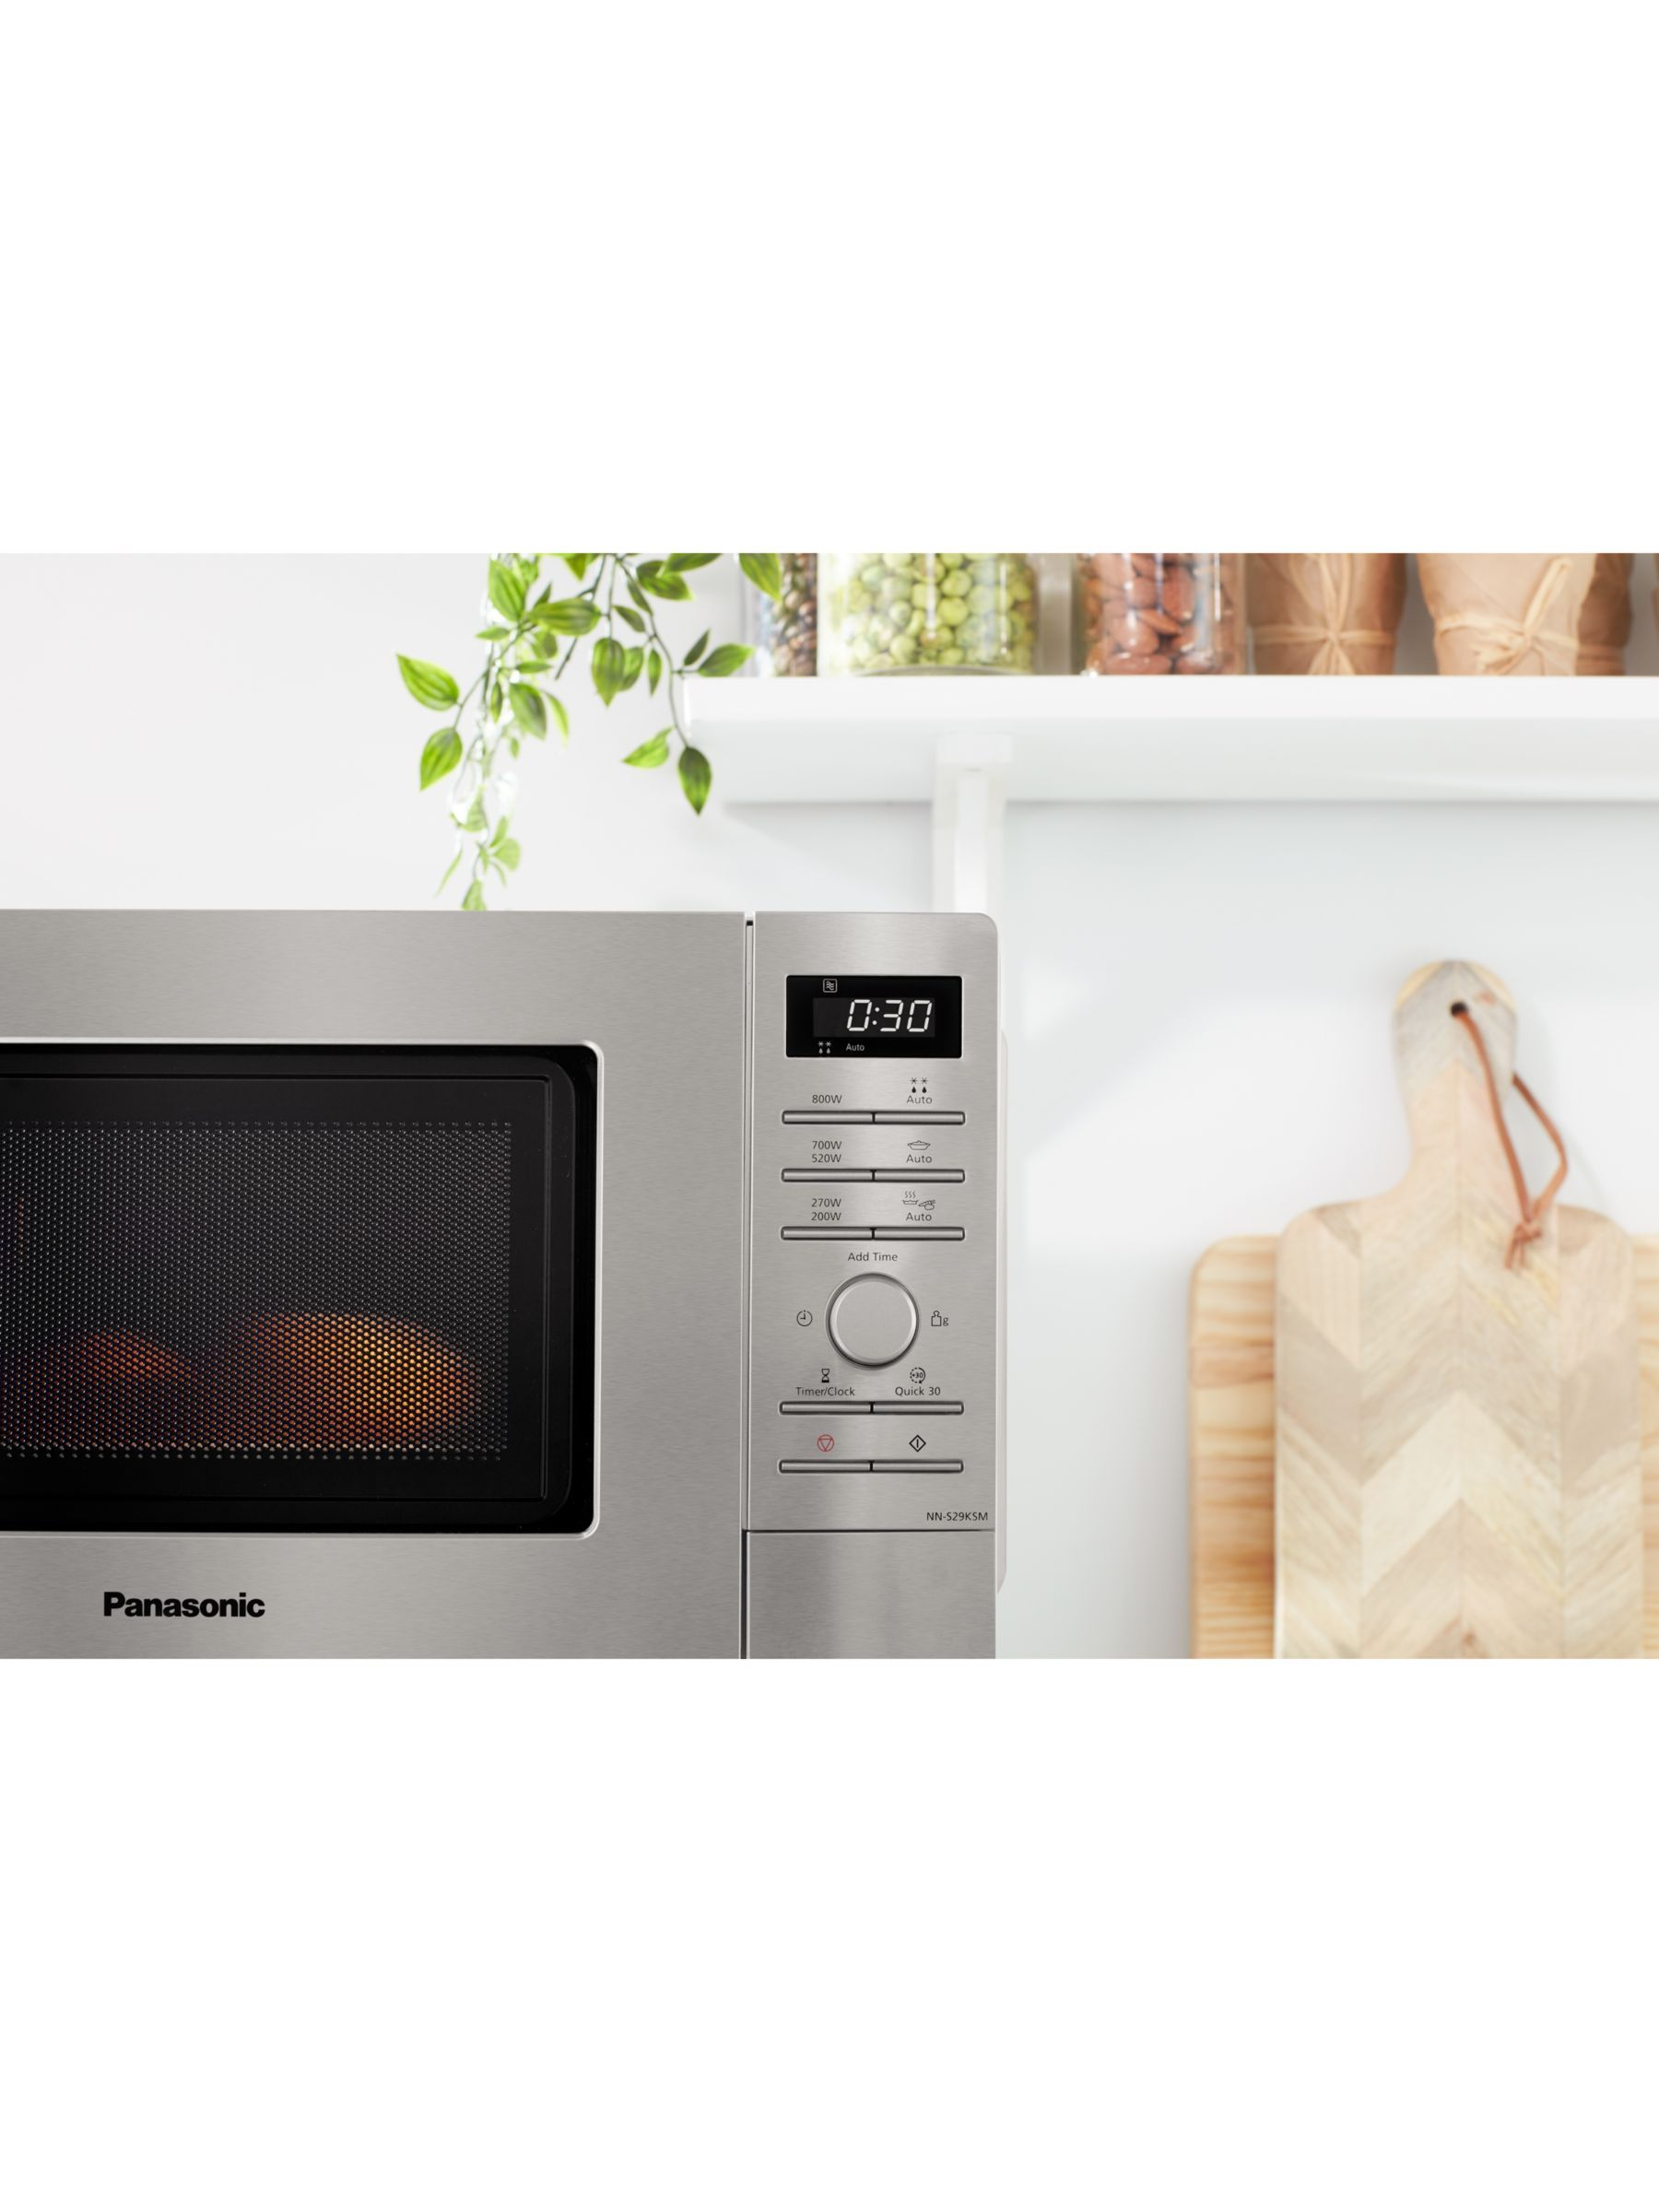 Panasonic NN S29KSMBPQ 20L Microwave